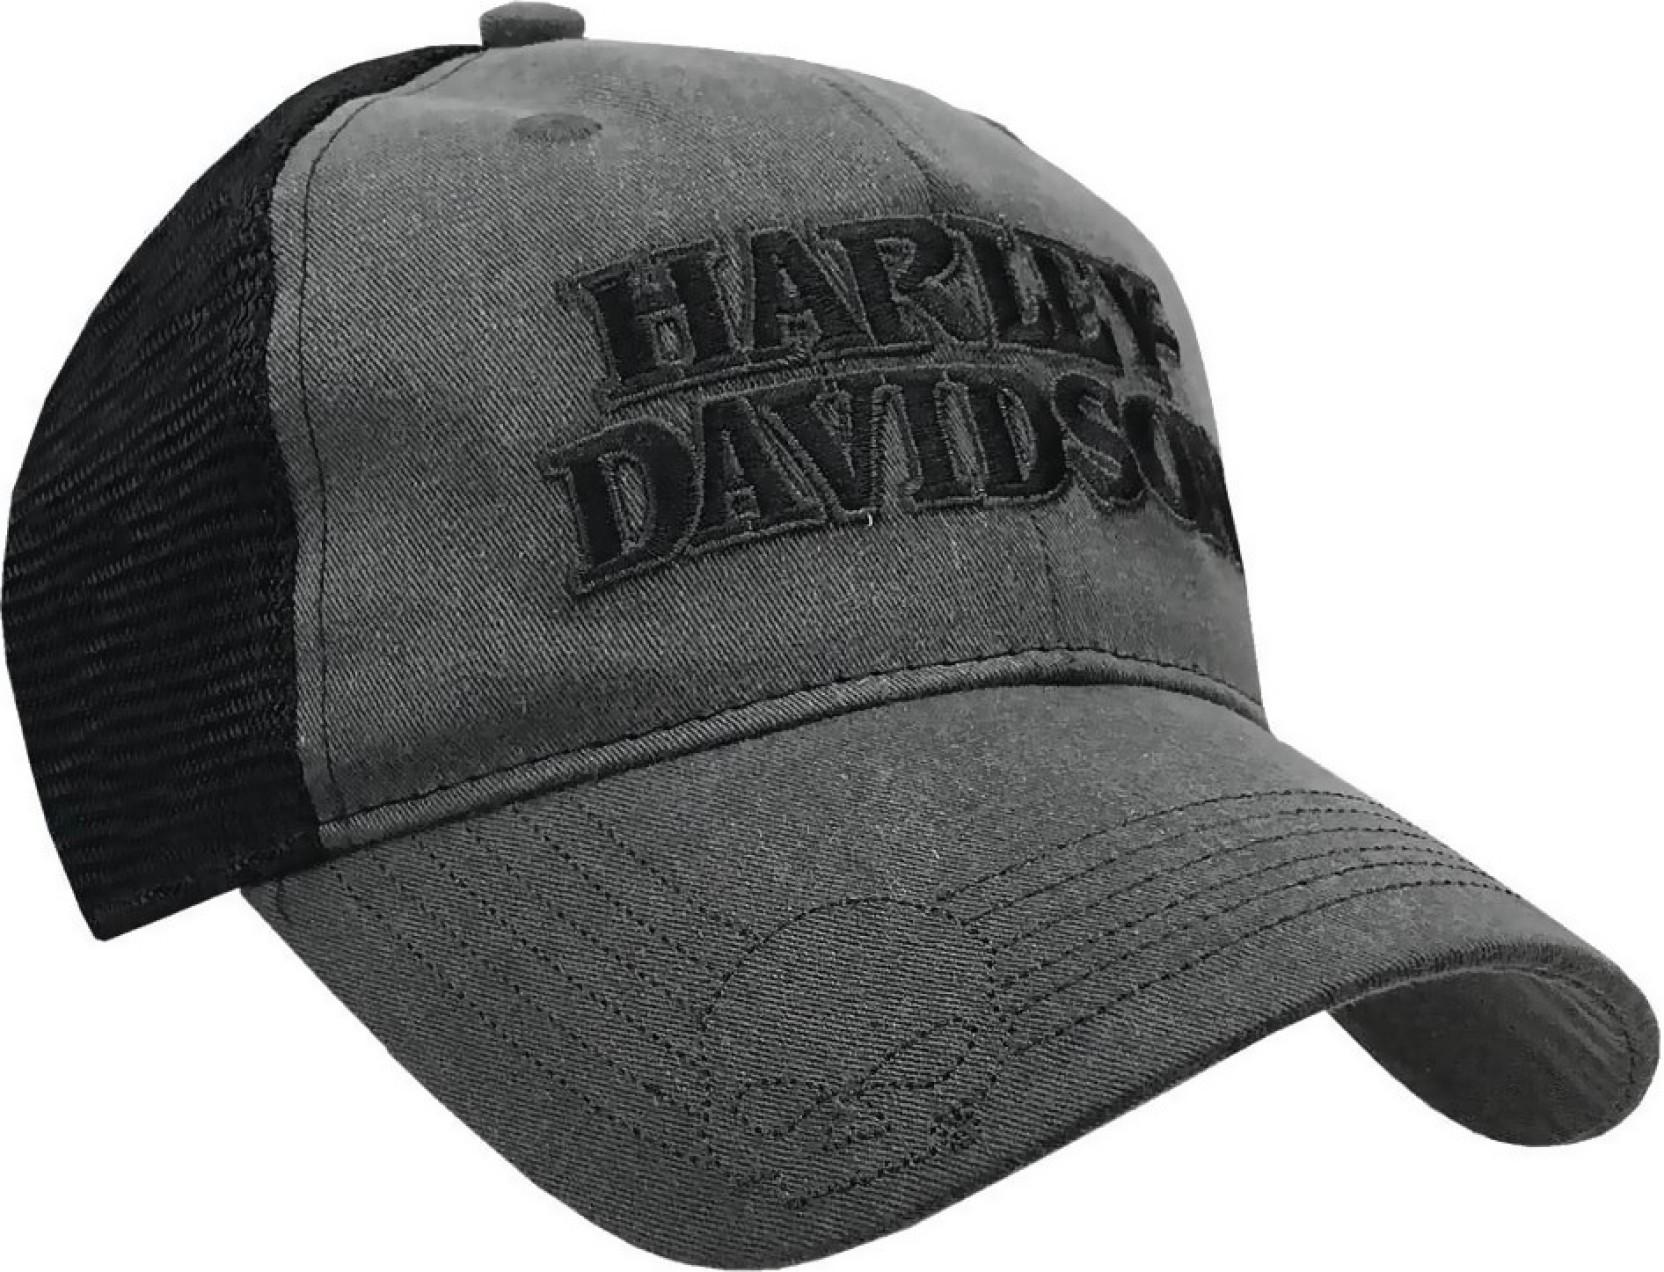 531bf5b074861 Harley Davidson Baseball Cap - Buy Harley Davidson Baseball Cap ...